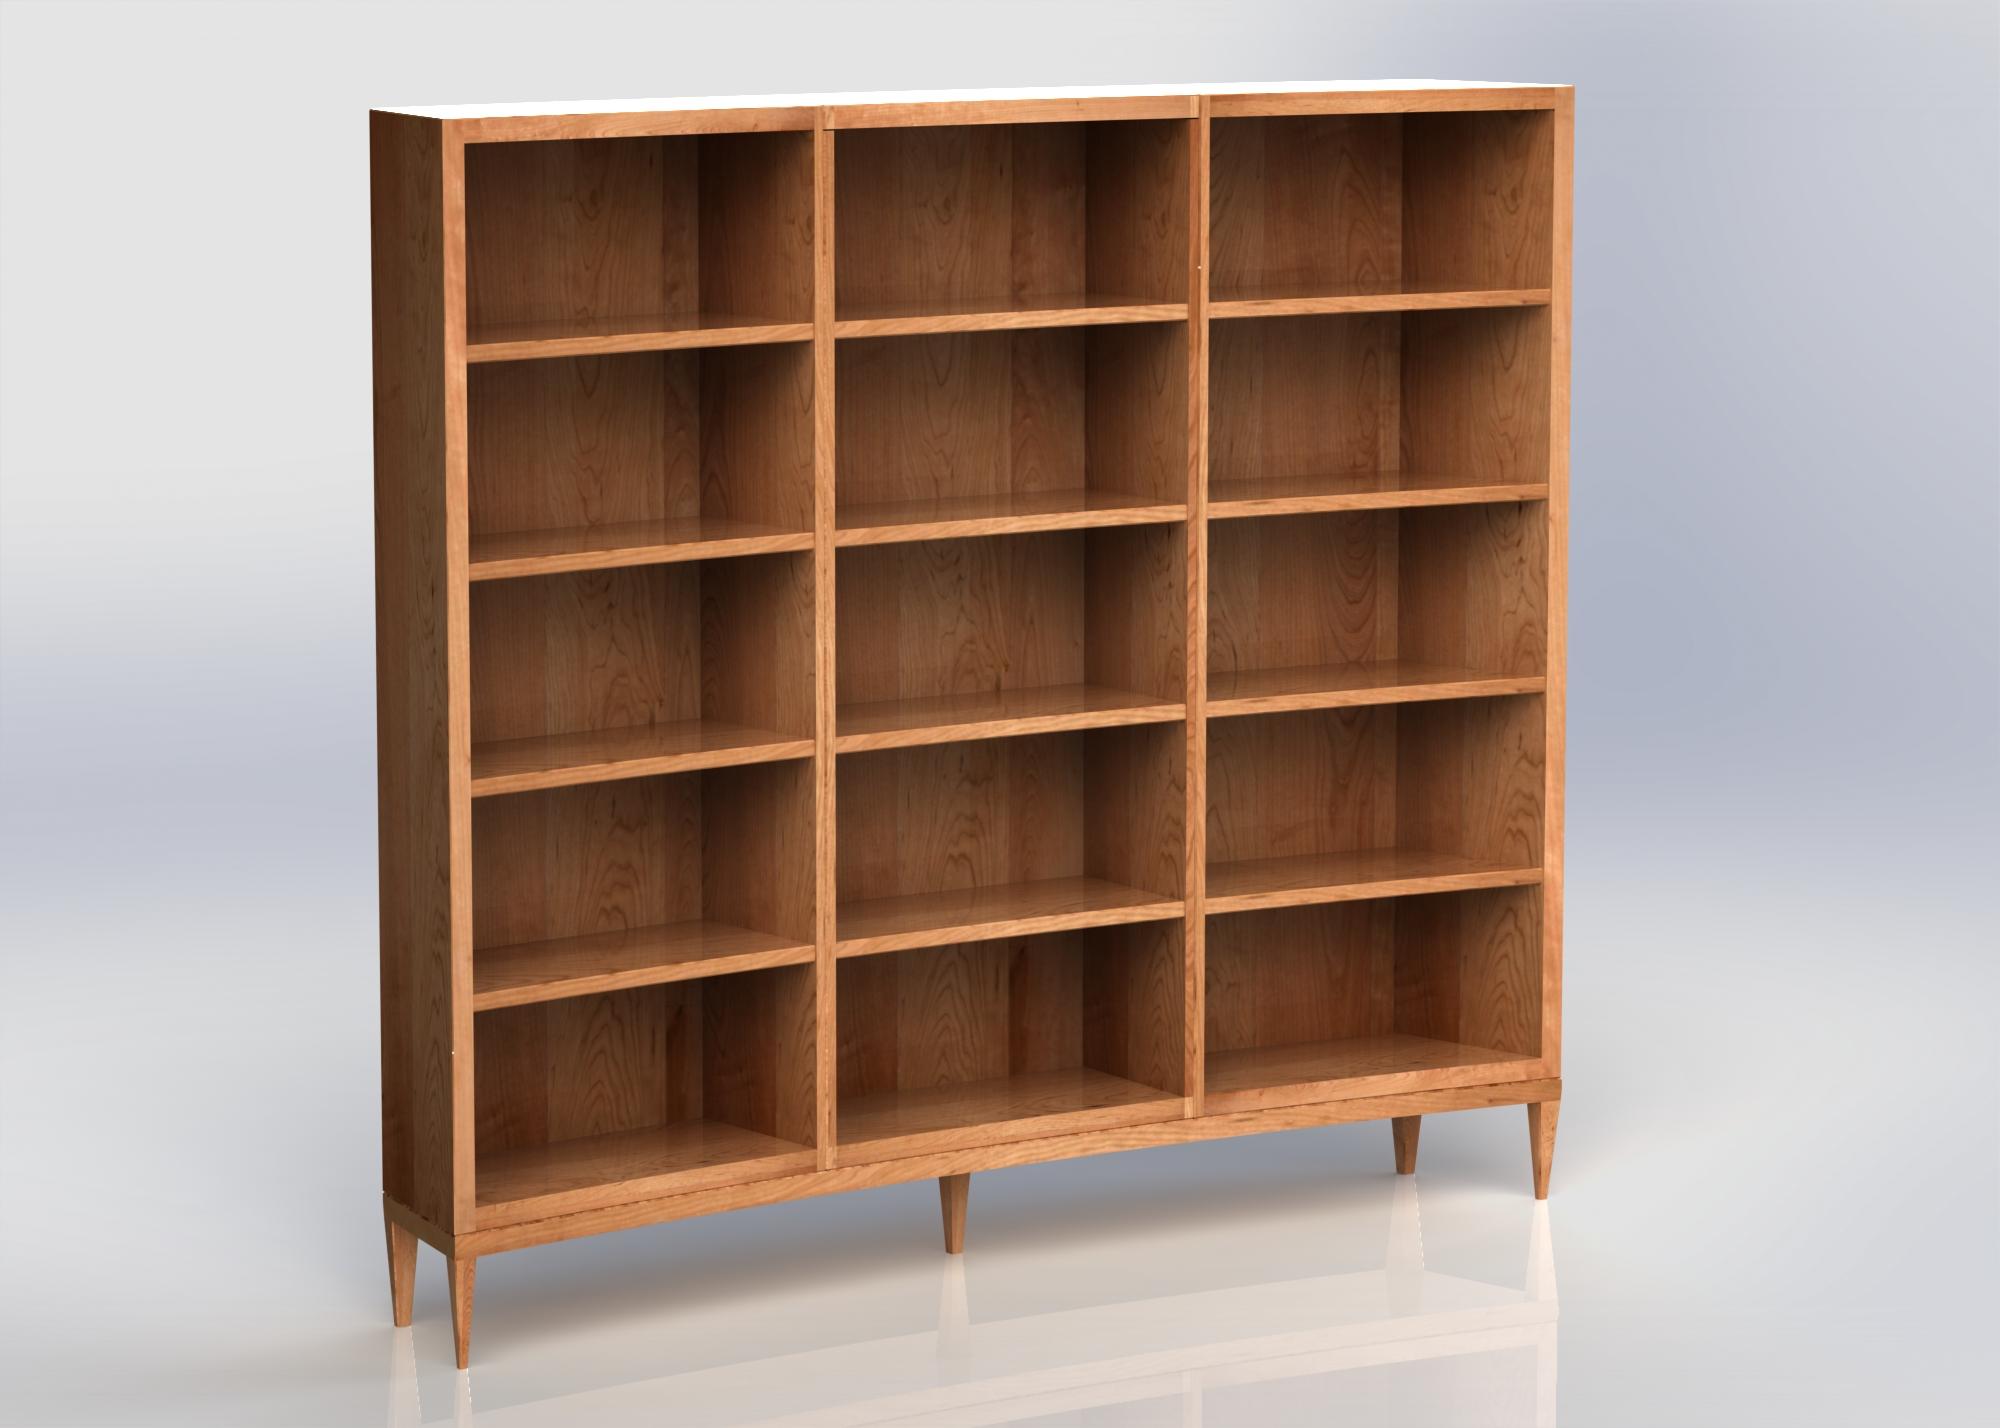 3_Part_Curved_Bookshelf_10_Small_Legs.JPG